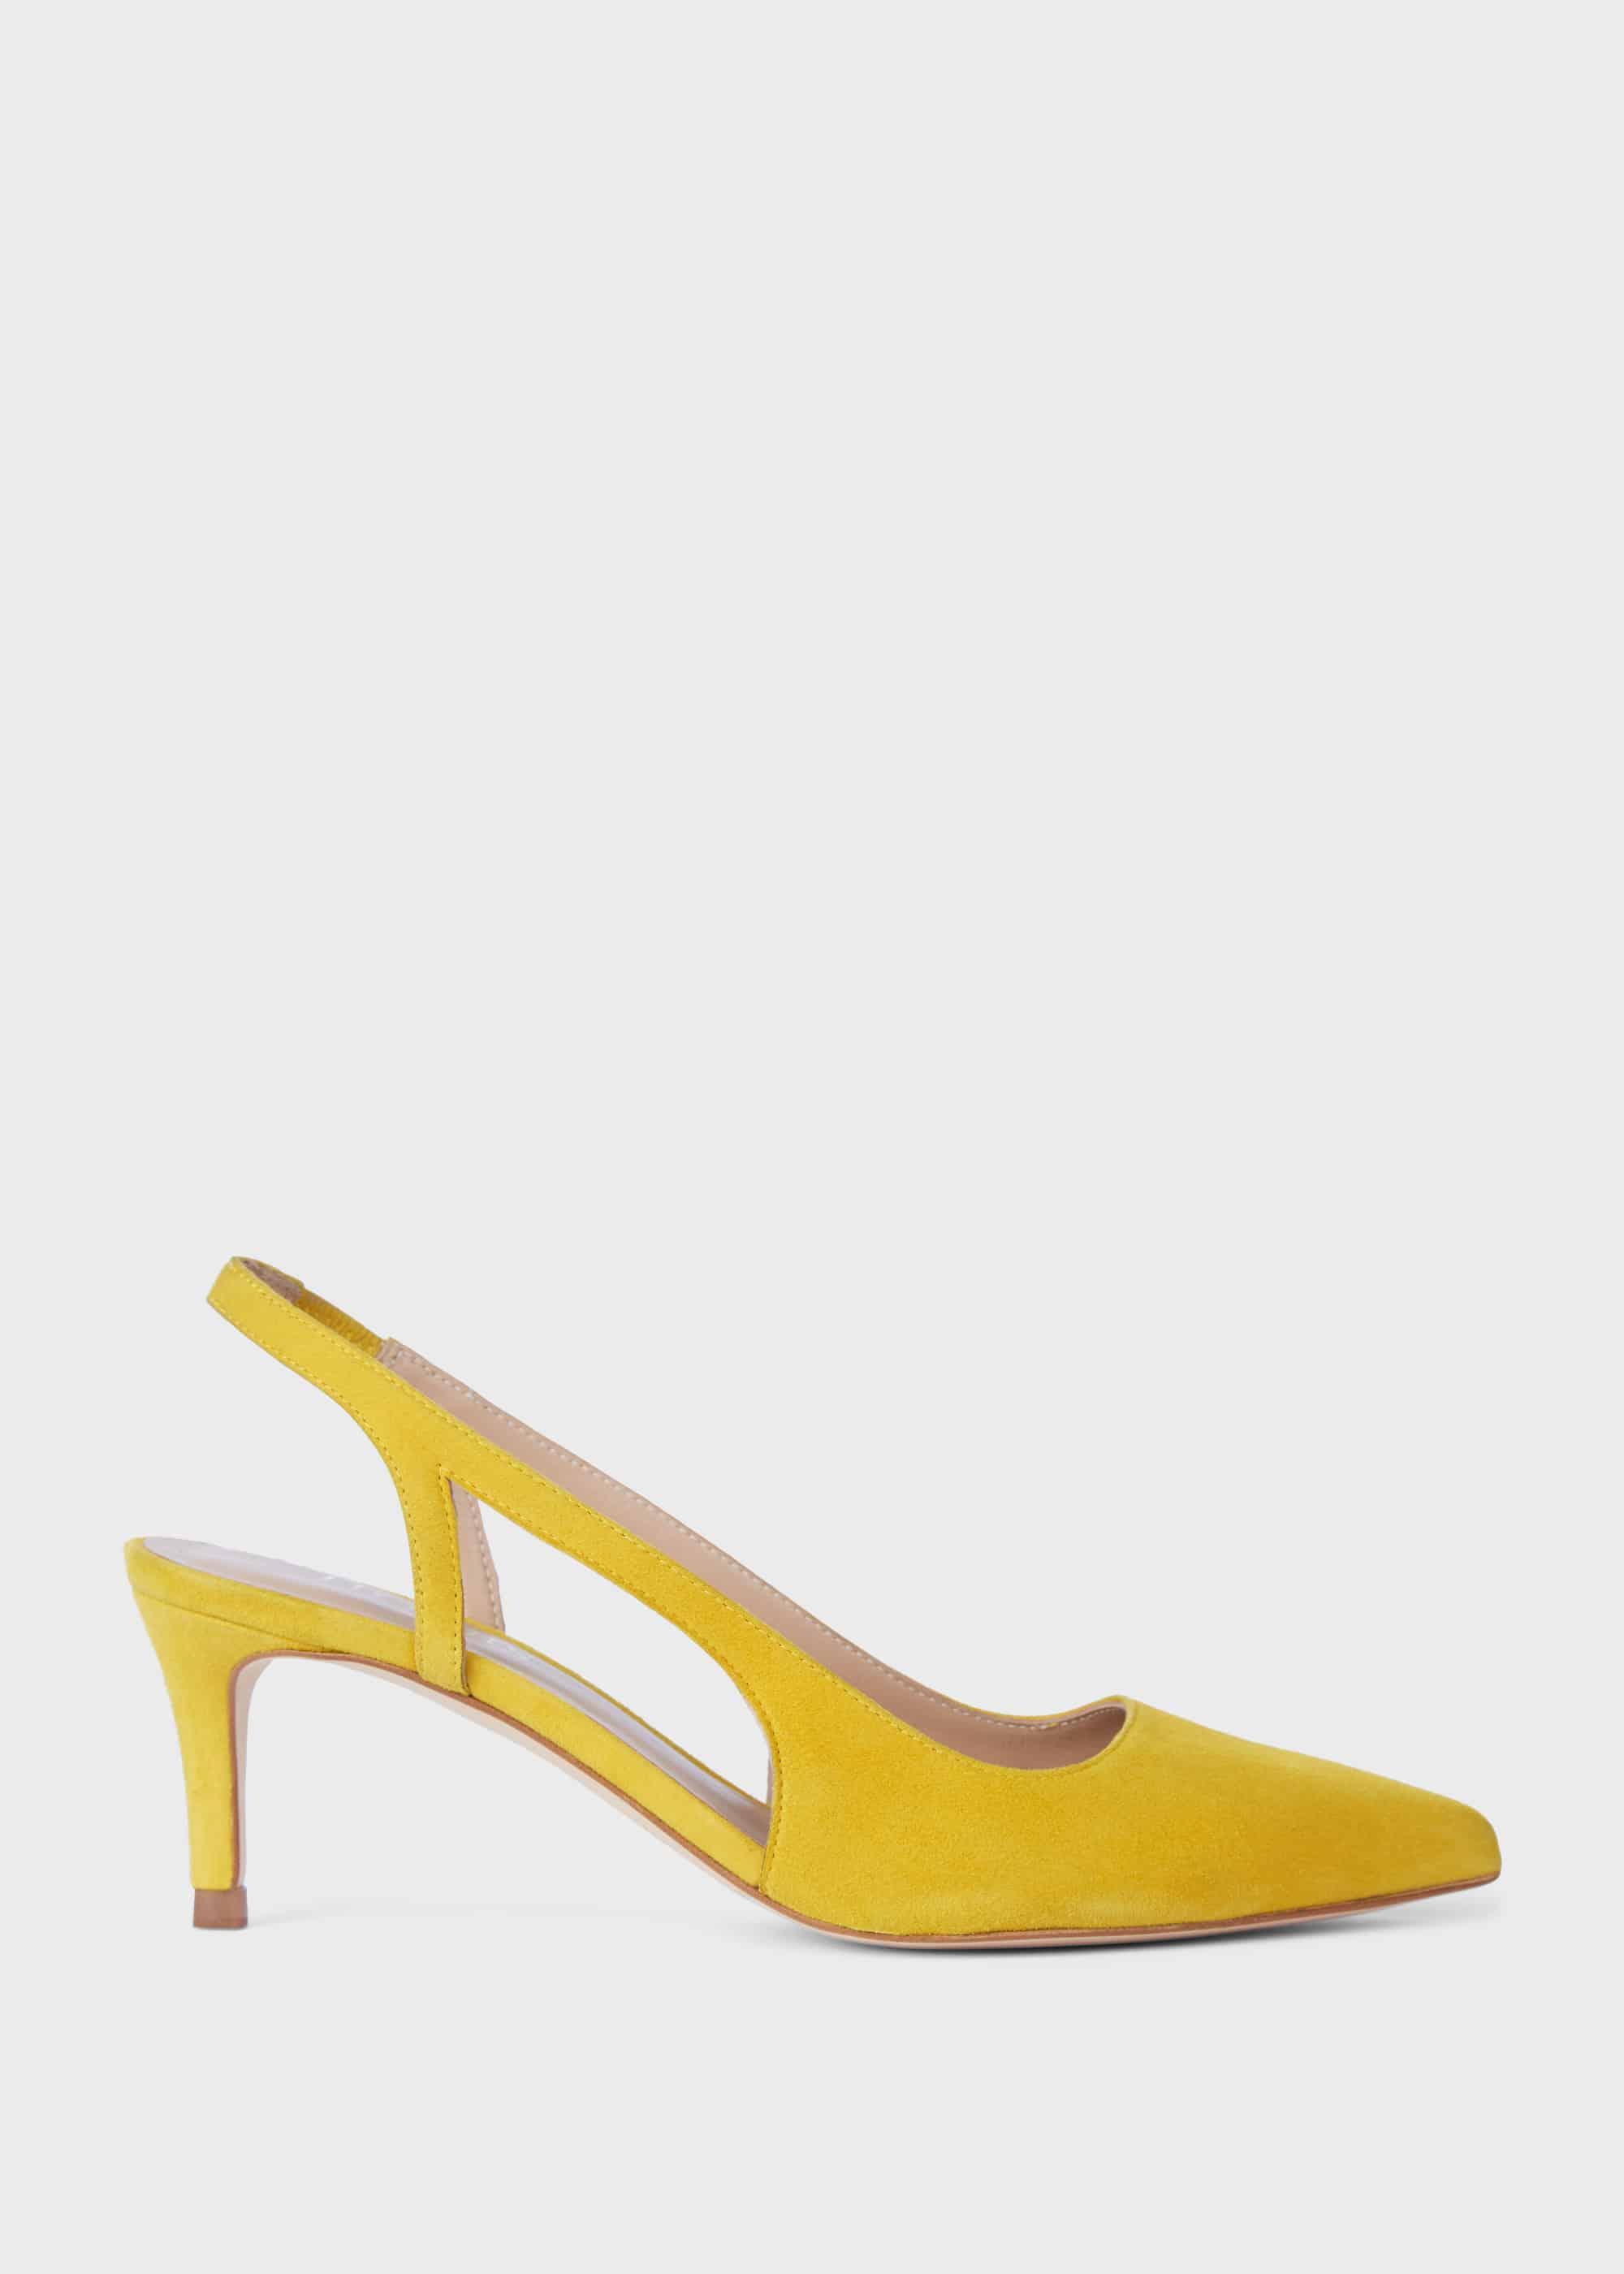 Hobbs Women Cleo Suede Slingback Shoes